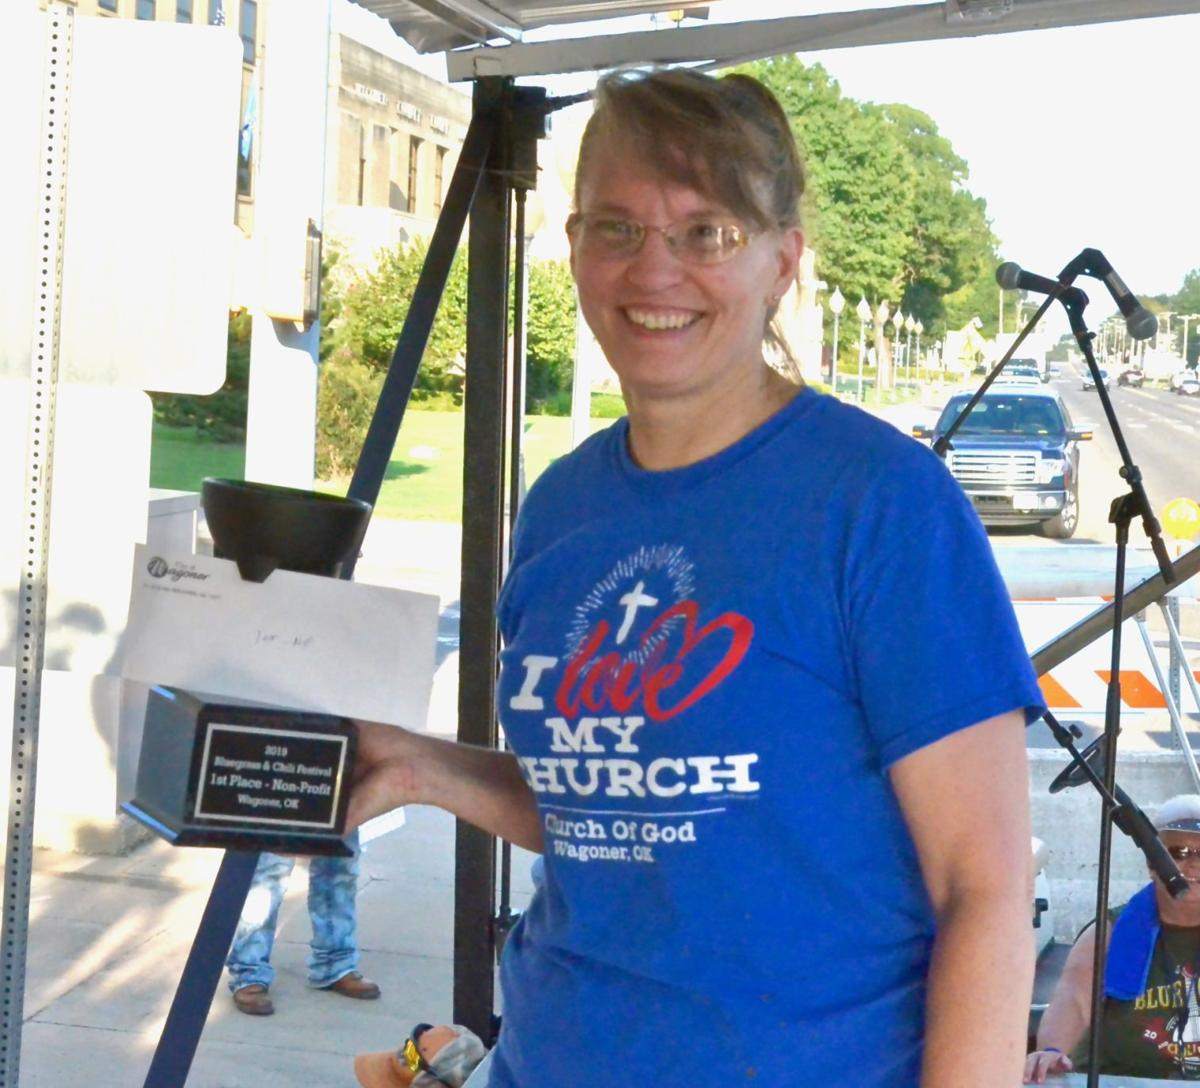 Virginia VonWald wins chili prize